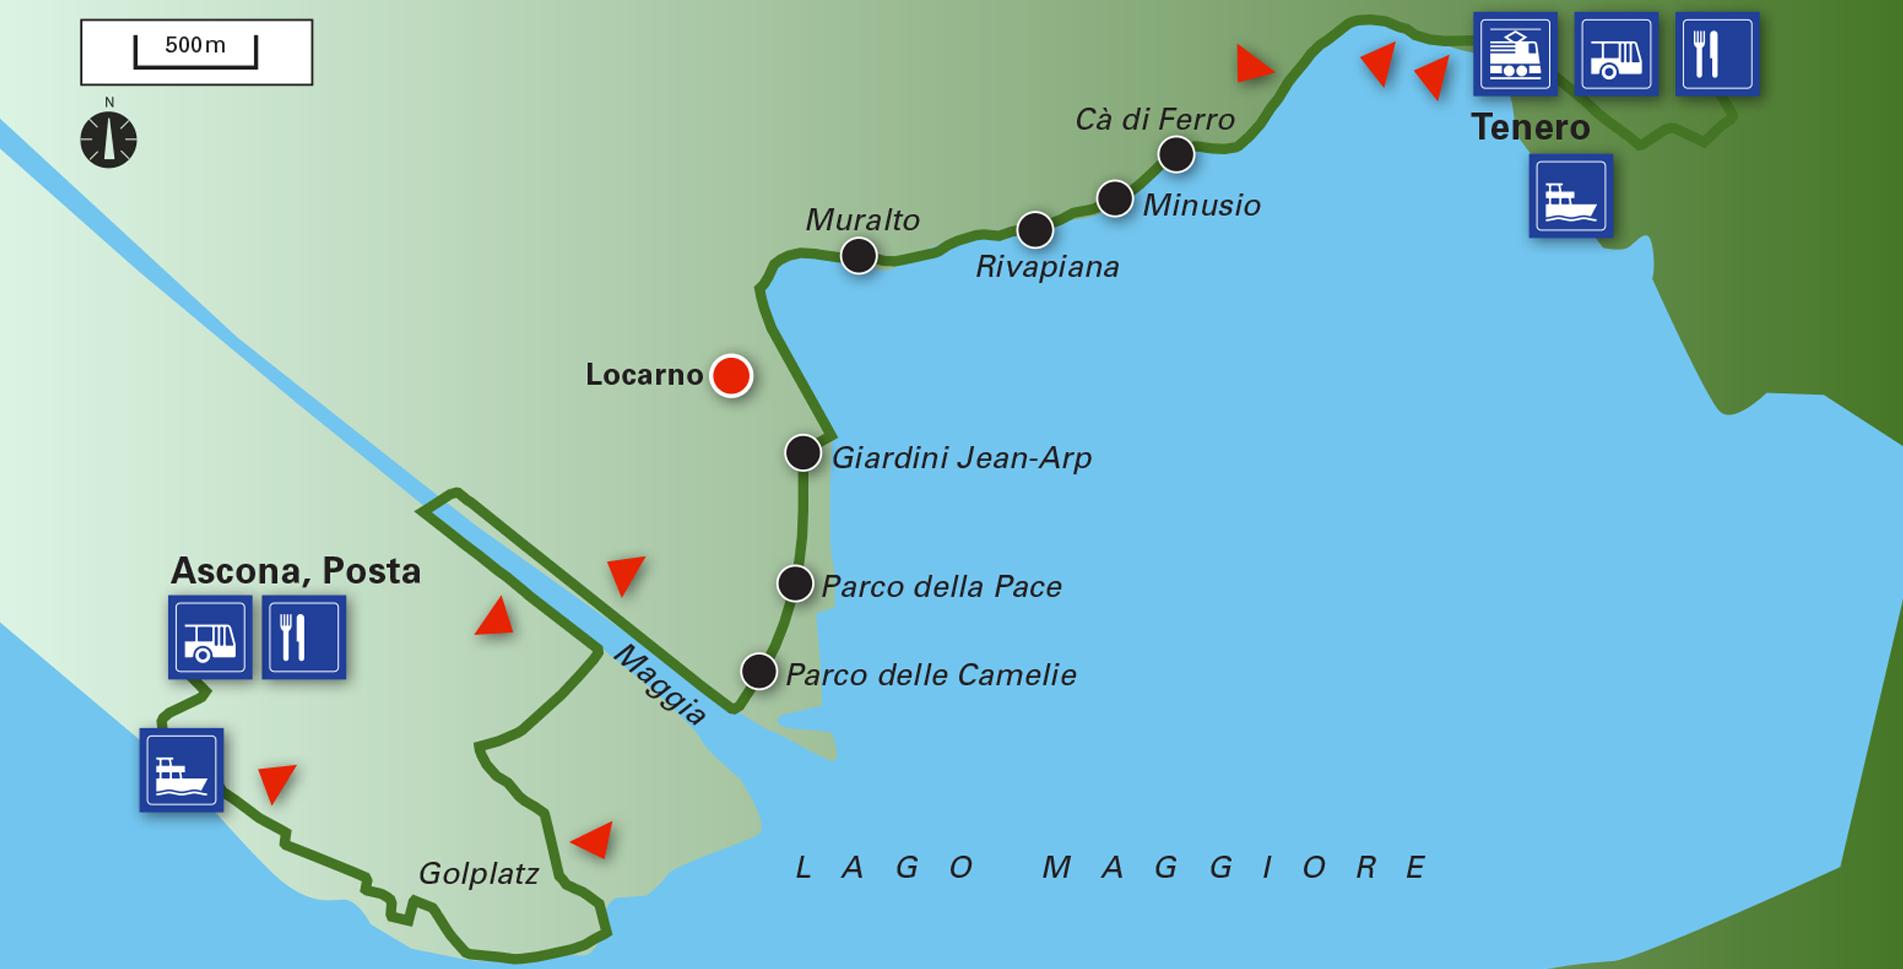 Wanderung von Tenero via Locarno nach Ascona am Lago Maggiore entlang